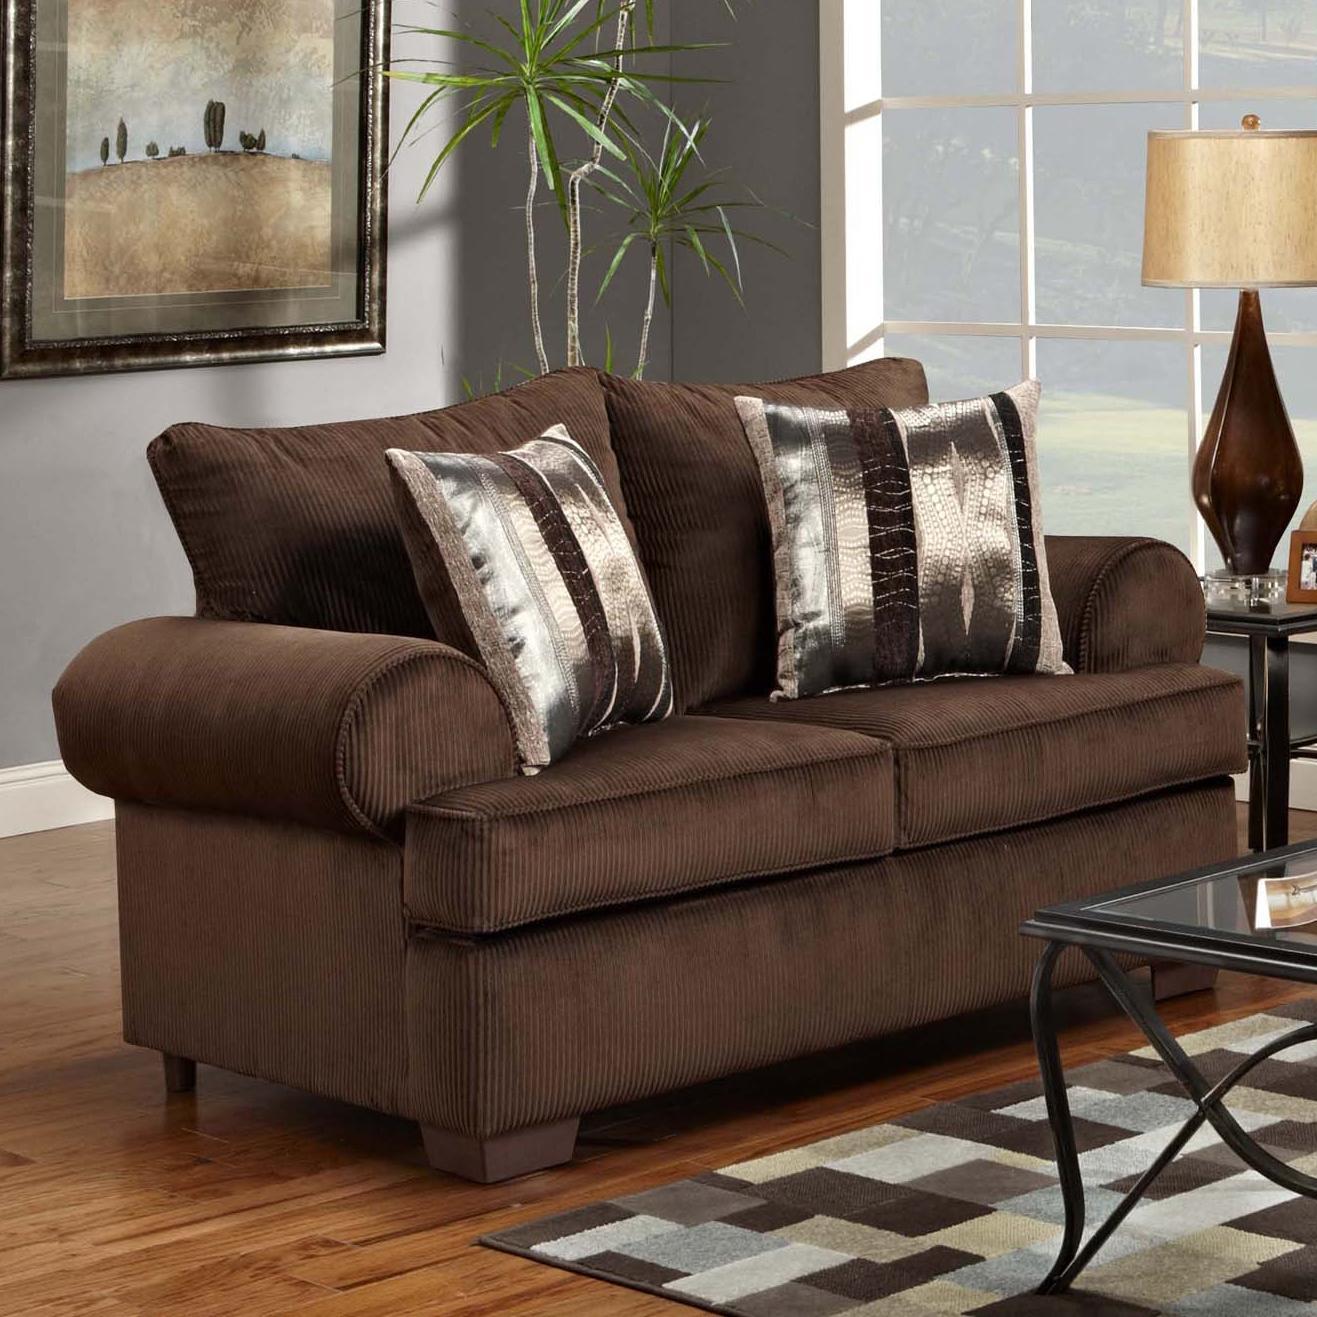 Affordable Furniture 6400 Loveseat - Item Number: 6402 B